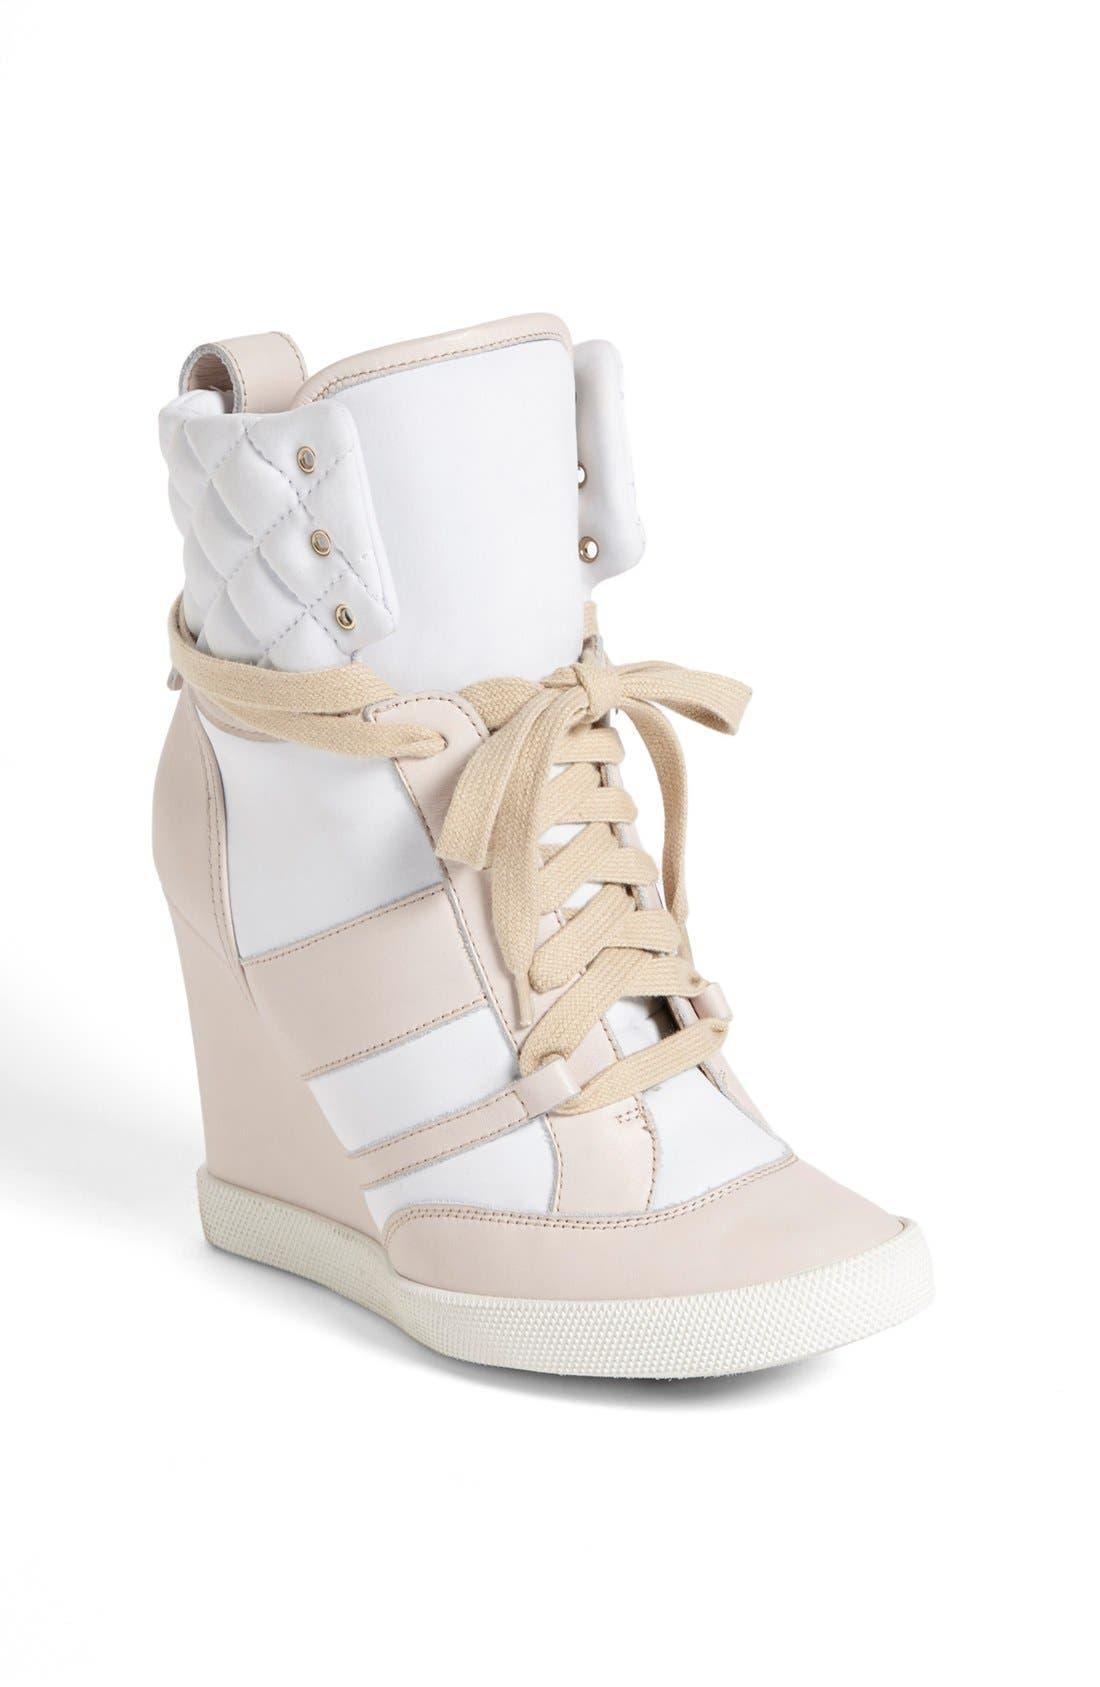 Alternate Image 1 Selected - Chloé 'Kasia' Wedge Sneaker